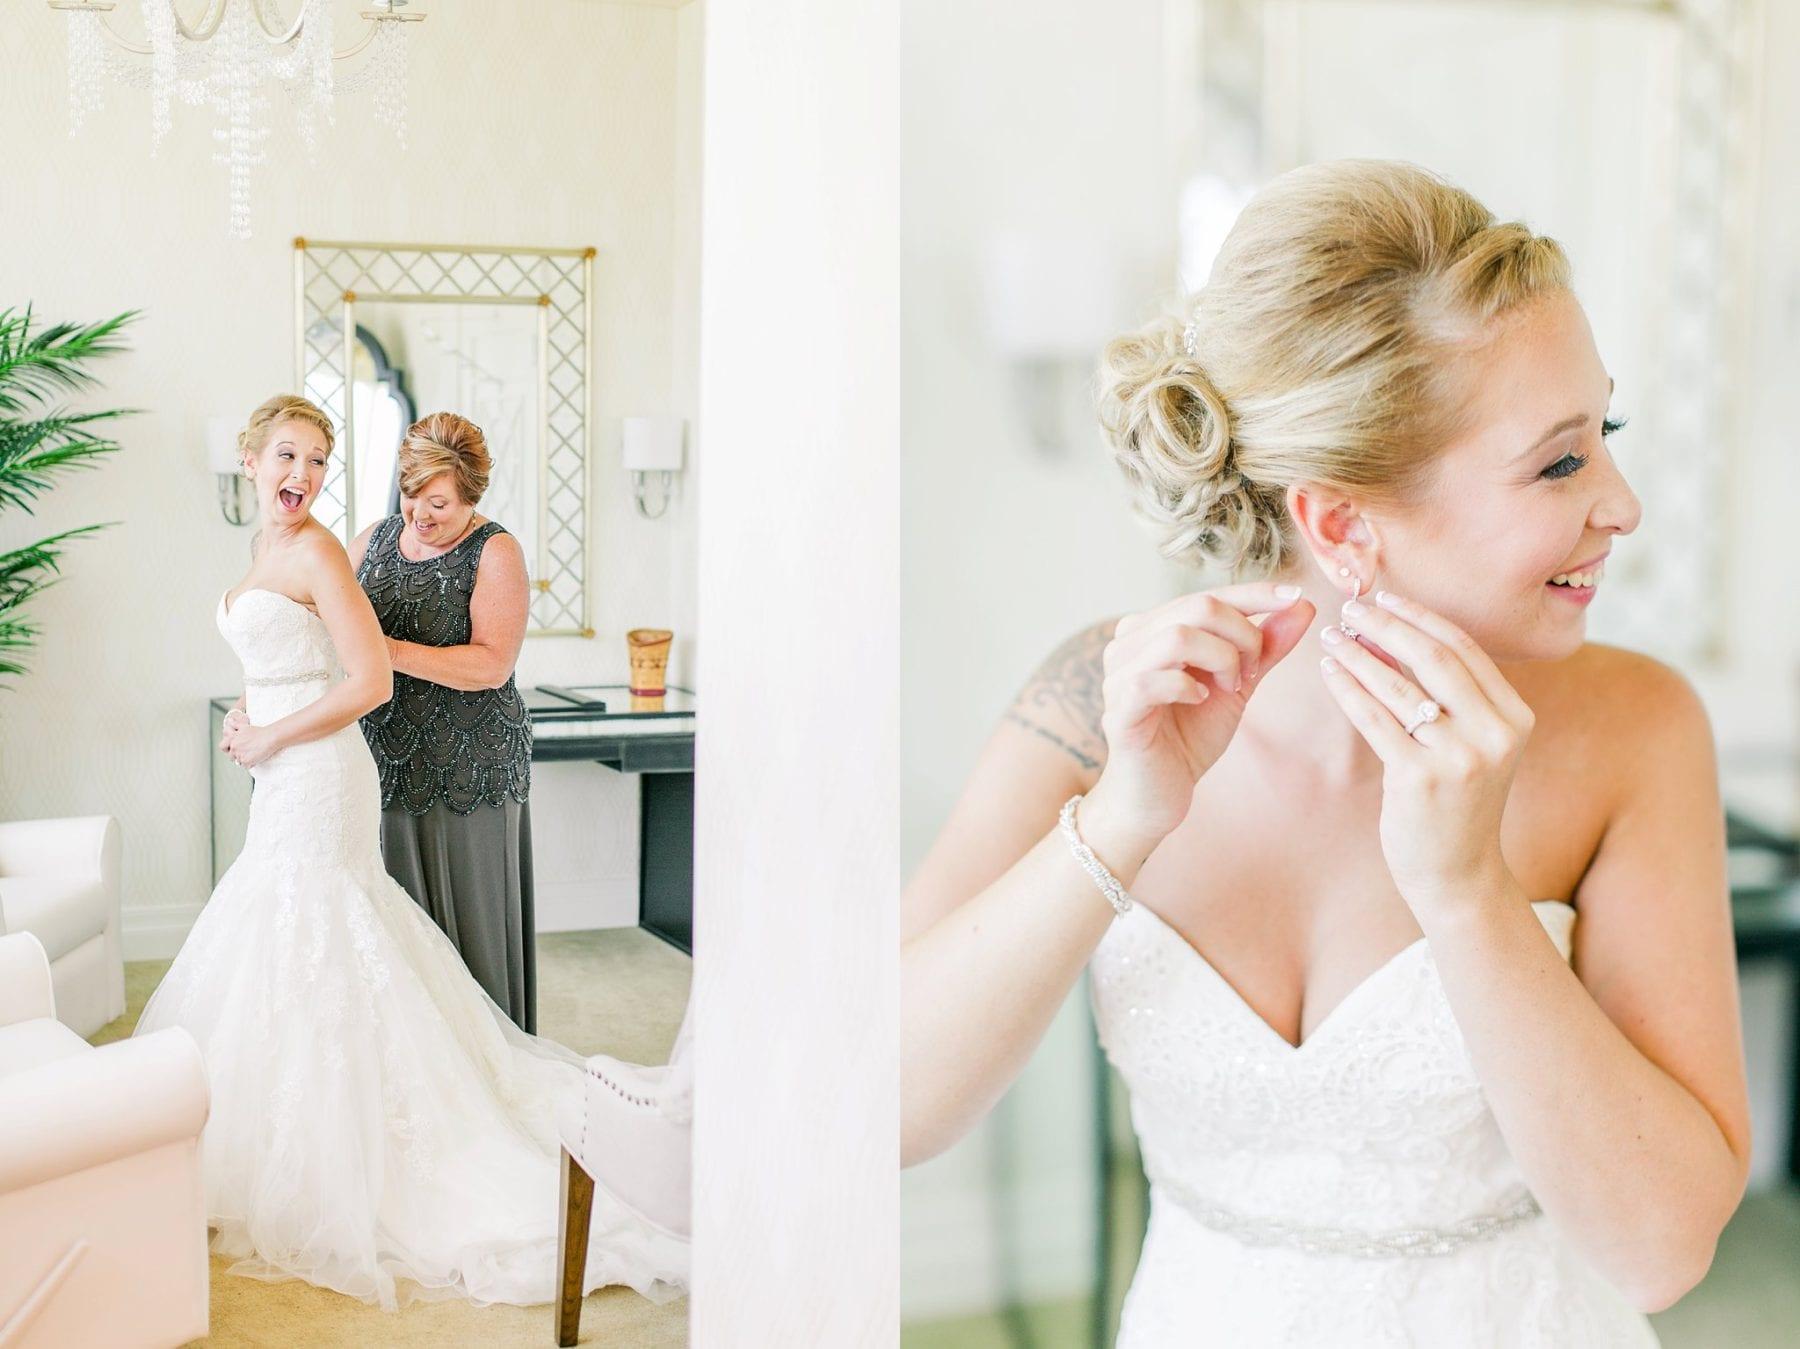 Waters Edge Wedding Photos Maryland Wedding Photographer Megan Kelsey Photography Katie & Conor-72.JPG